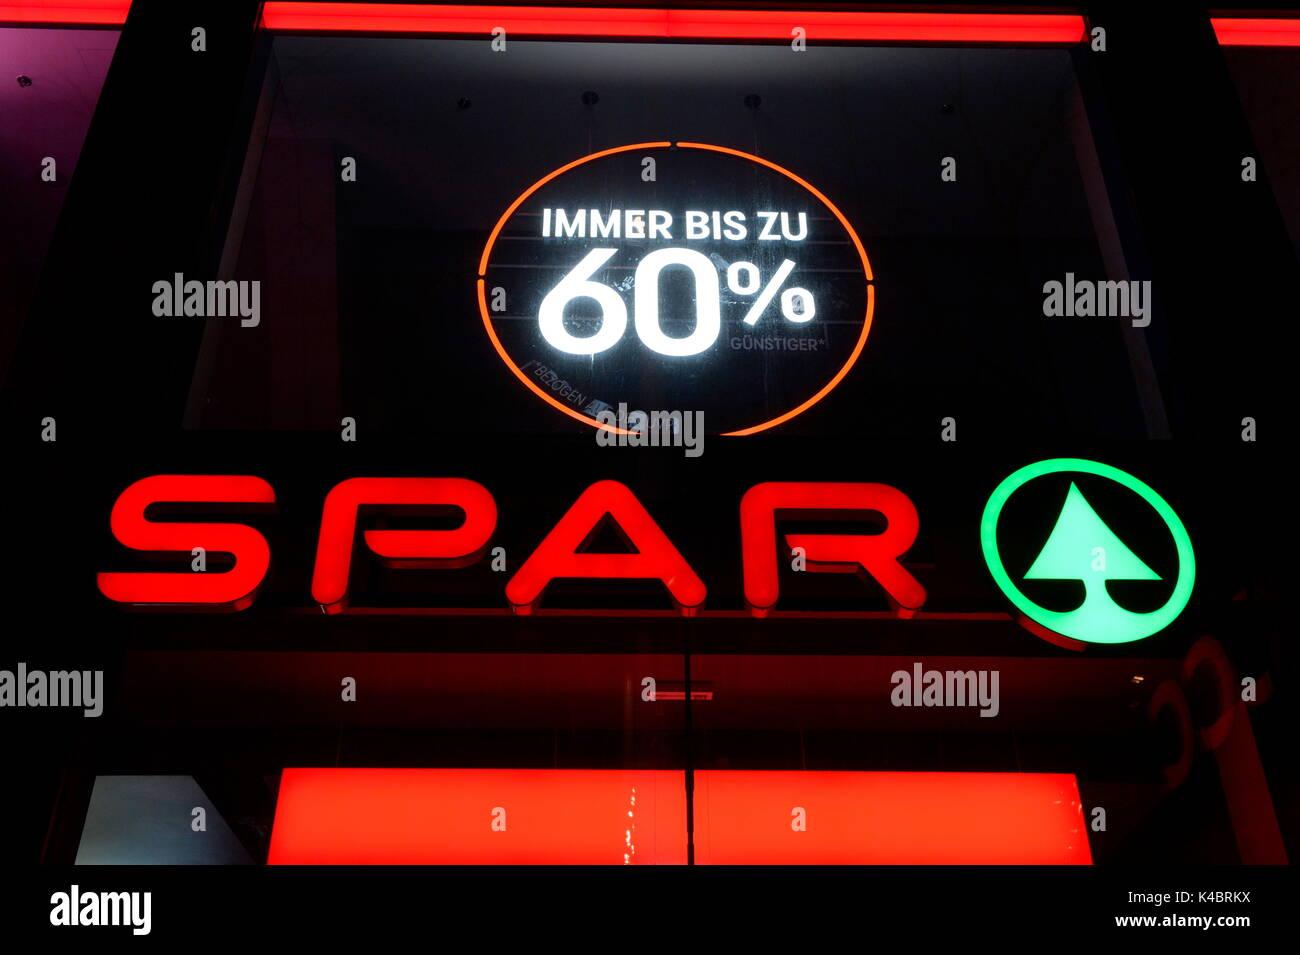 Spar Trading Chain In Vienna Stock Photo